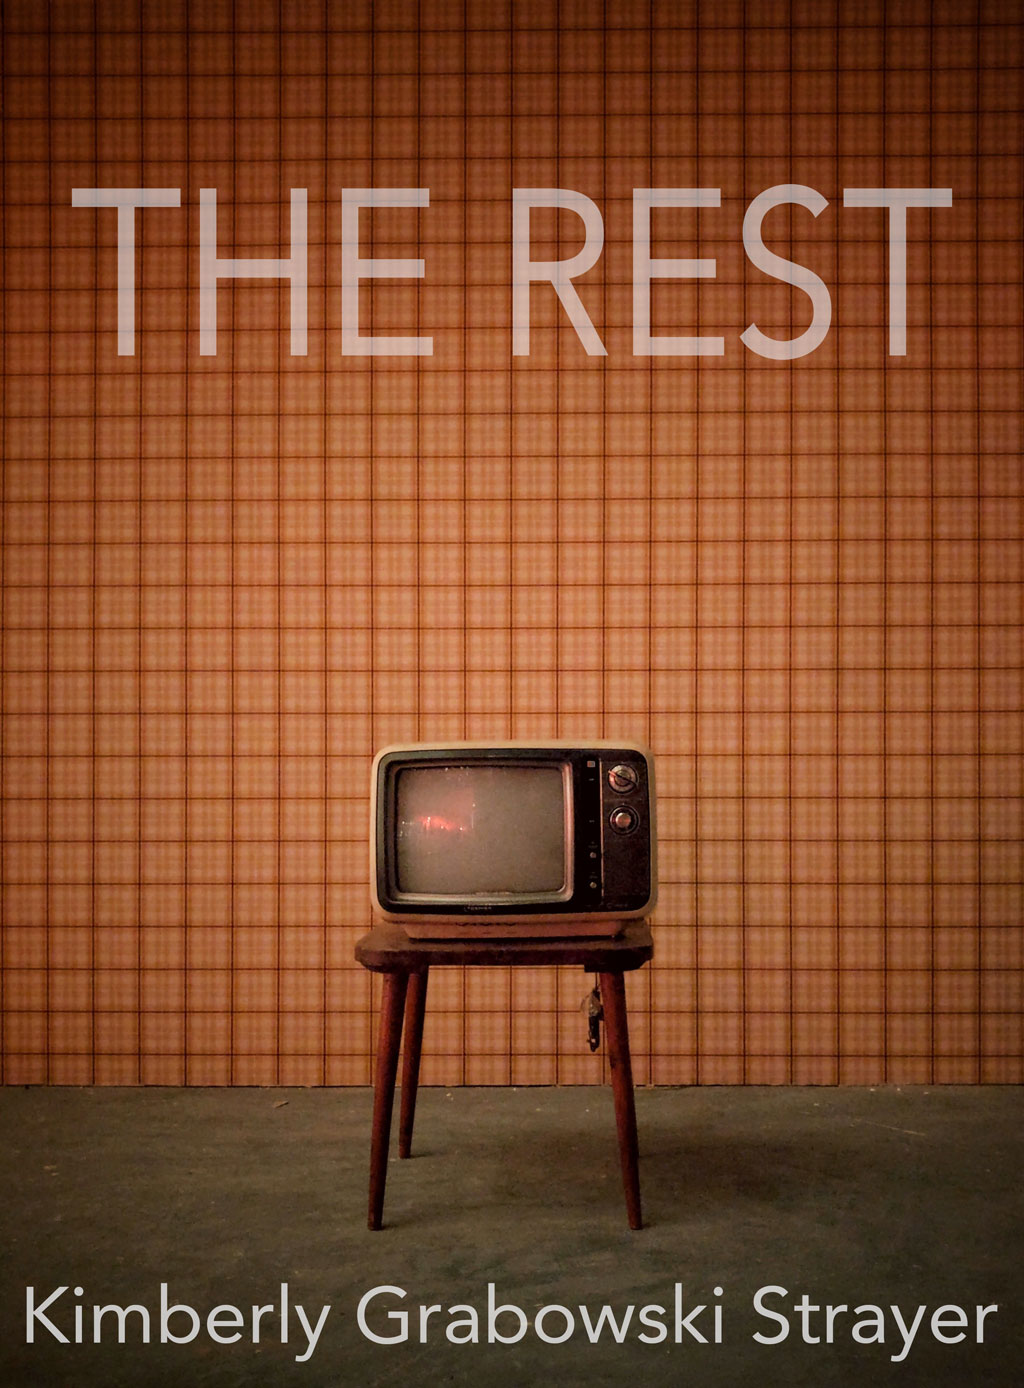 THE REST byKimberly Grabowski Strayer